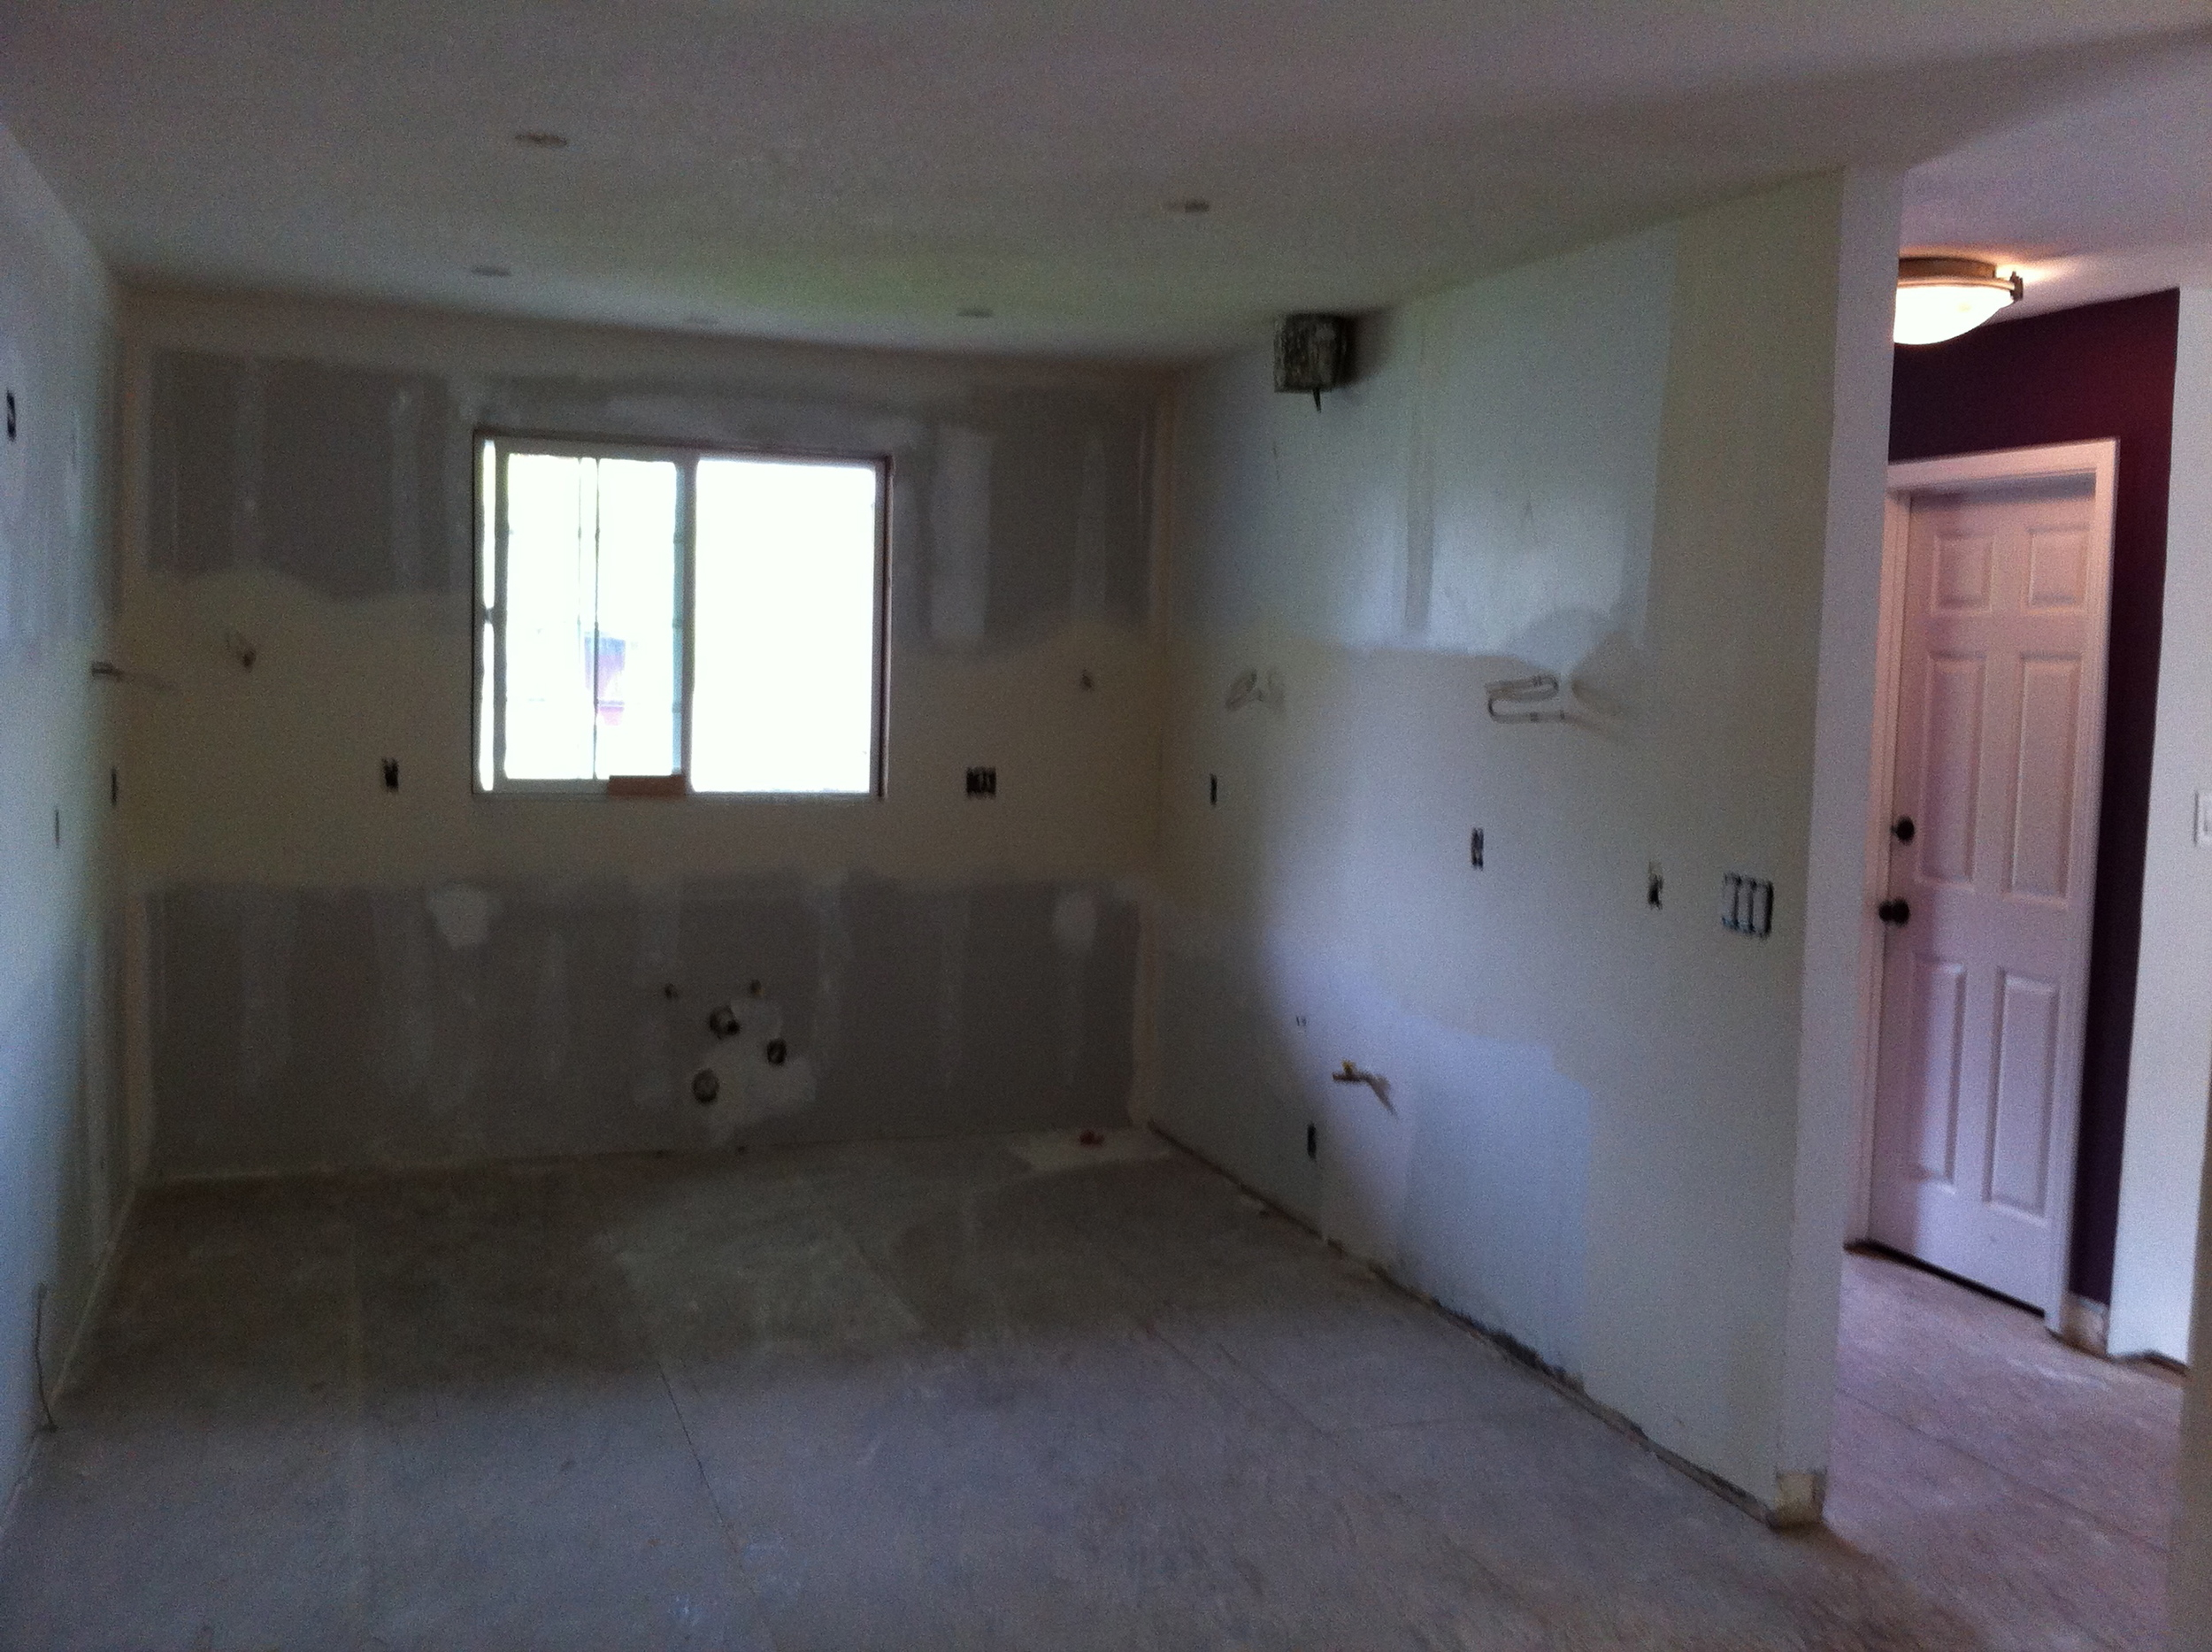 Drywall In